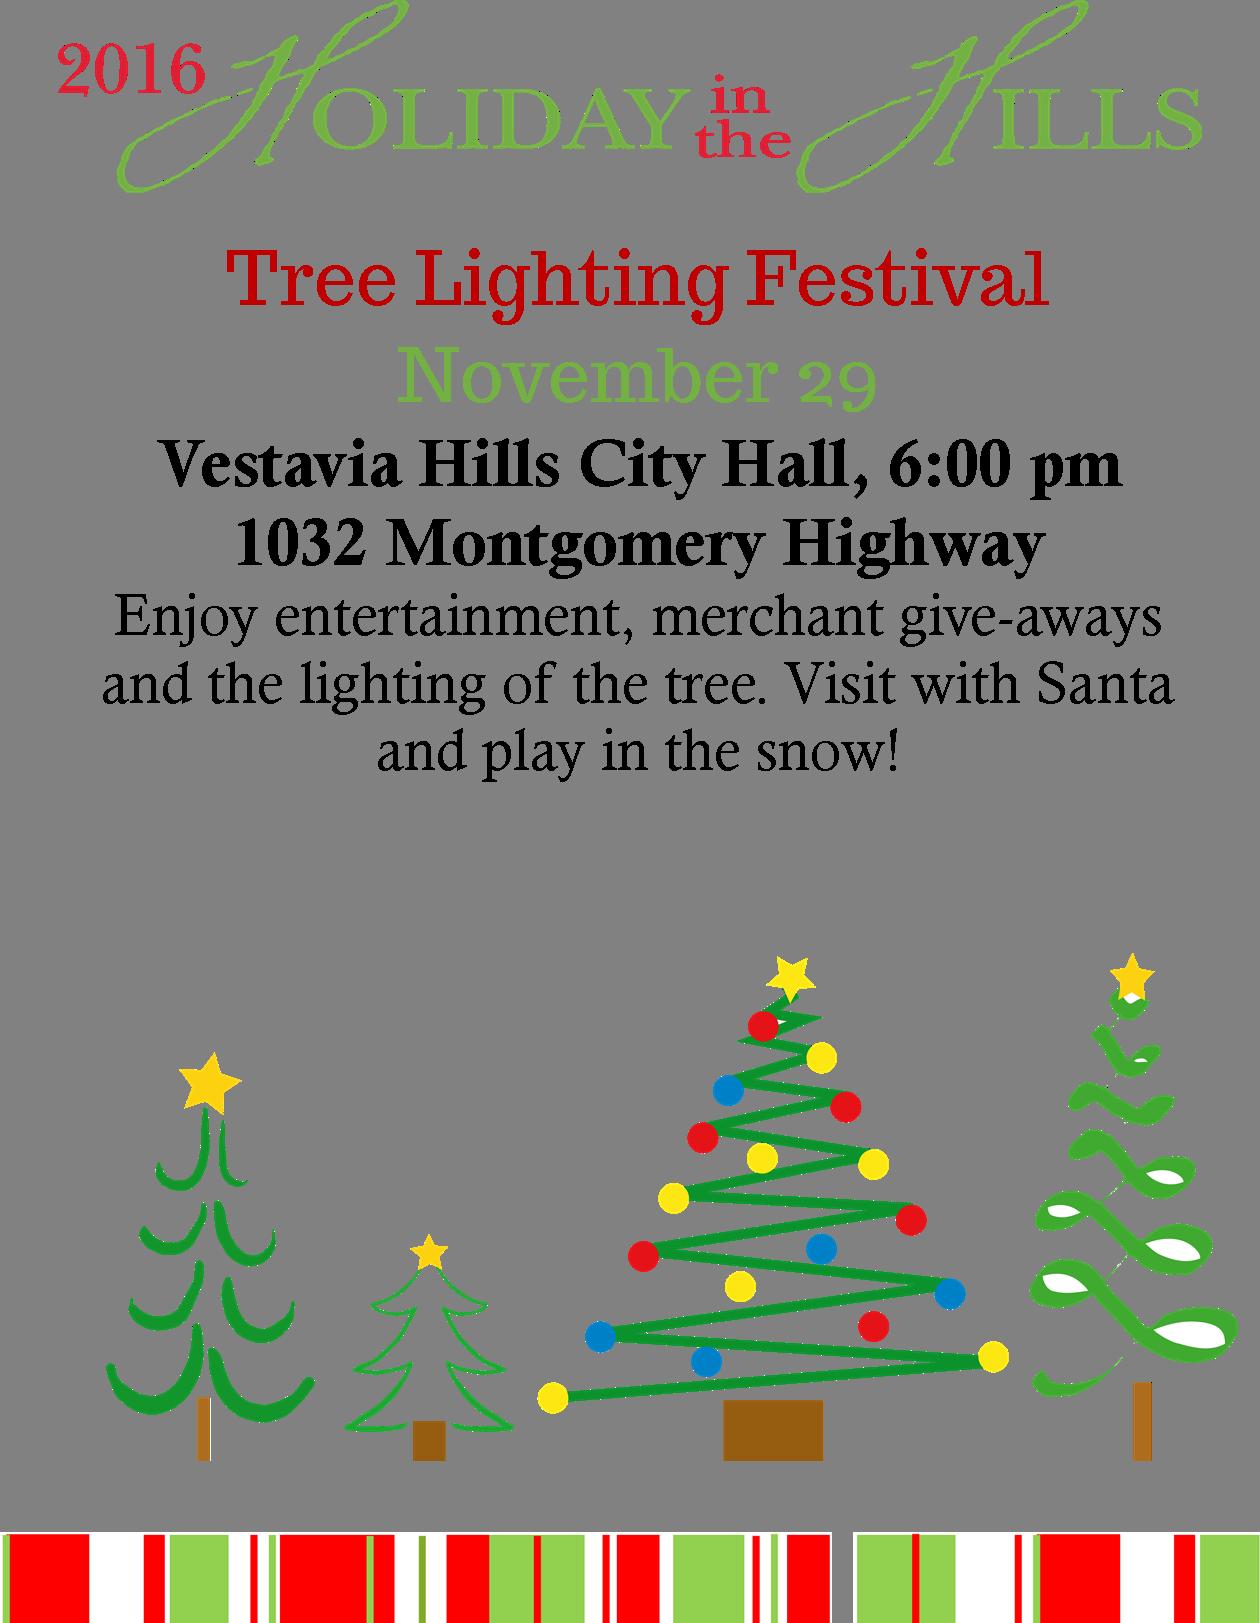 Holiday in the hills tree lighting festival vestavia for Ammons plumbing